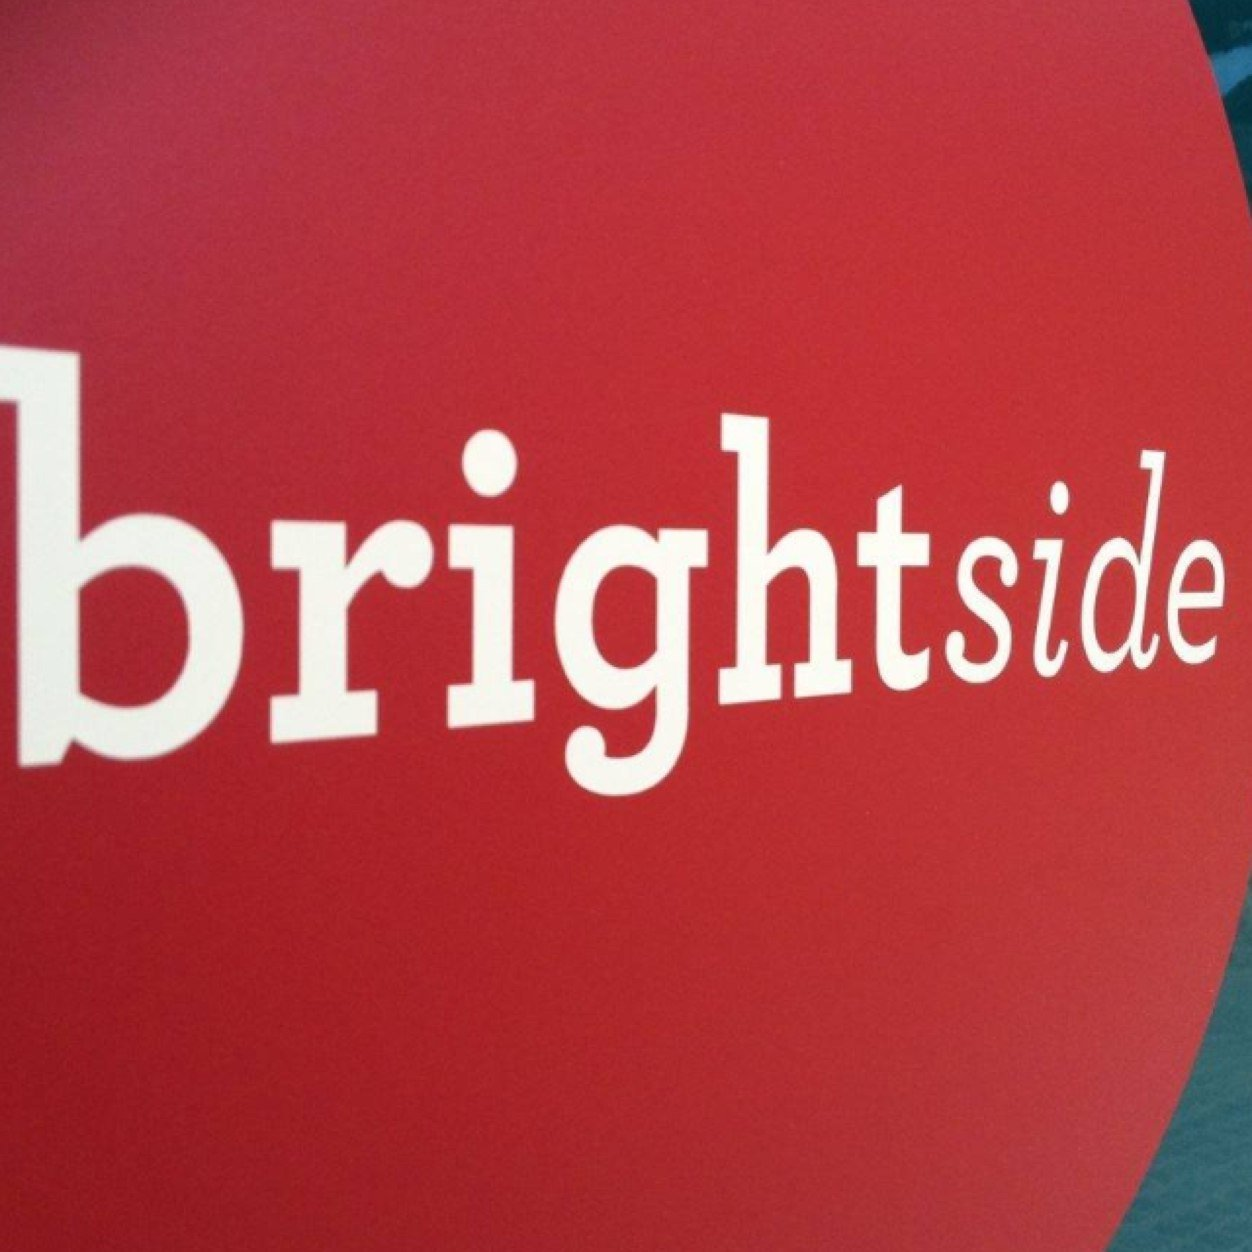 @Brightsidetours